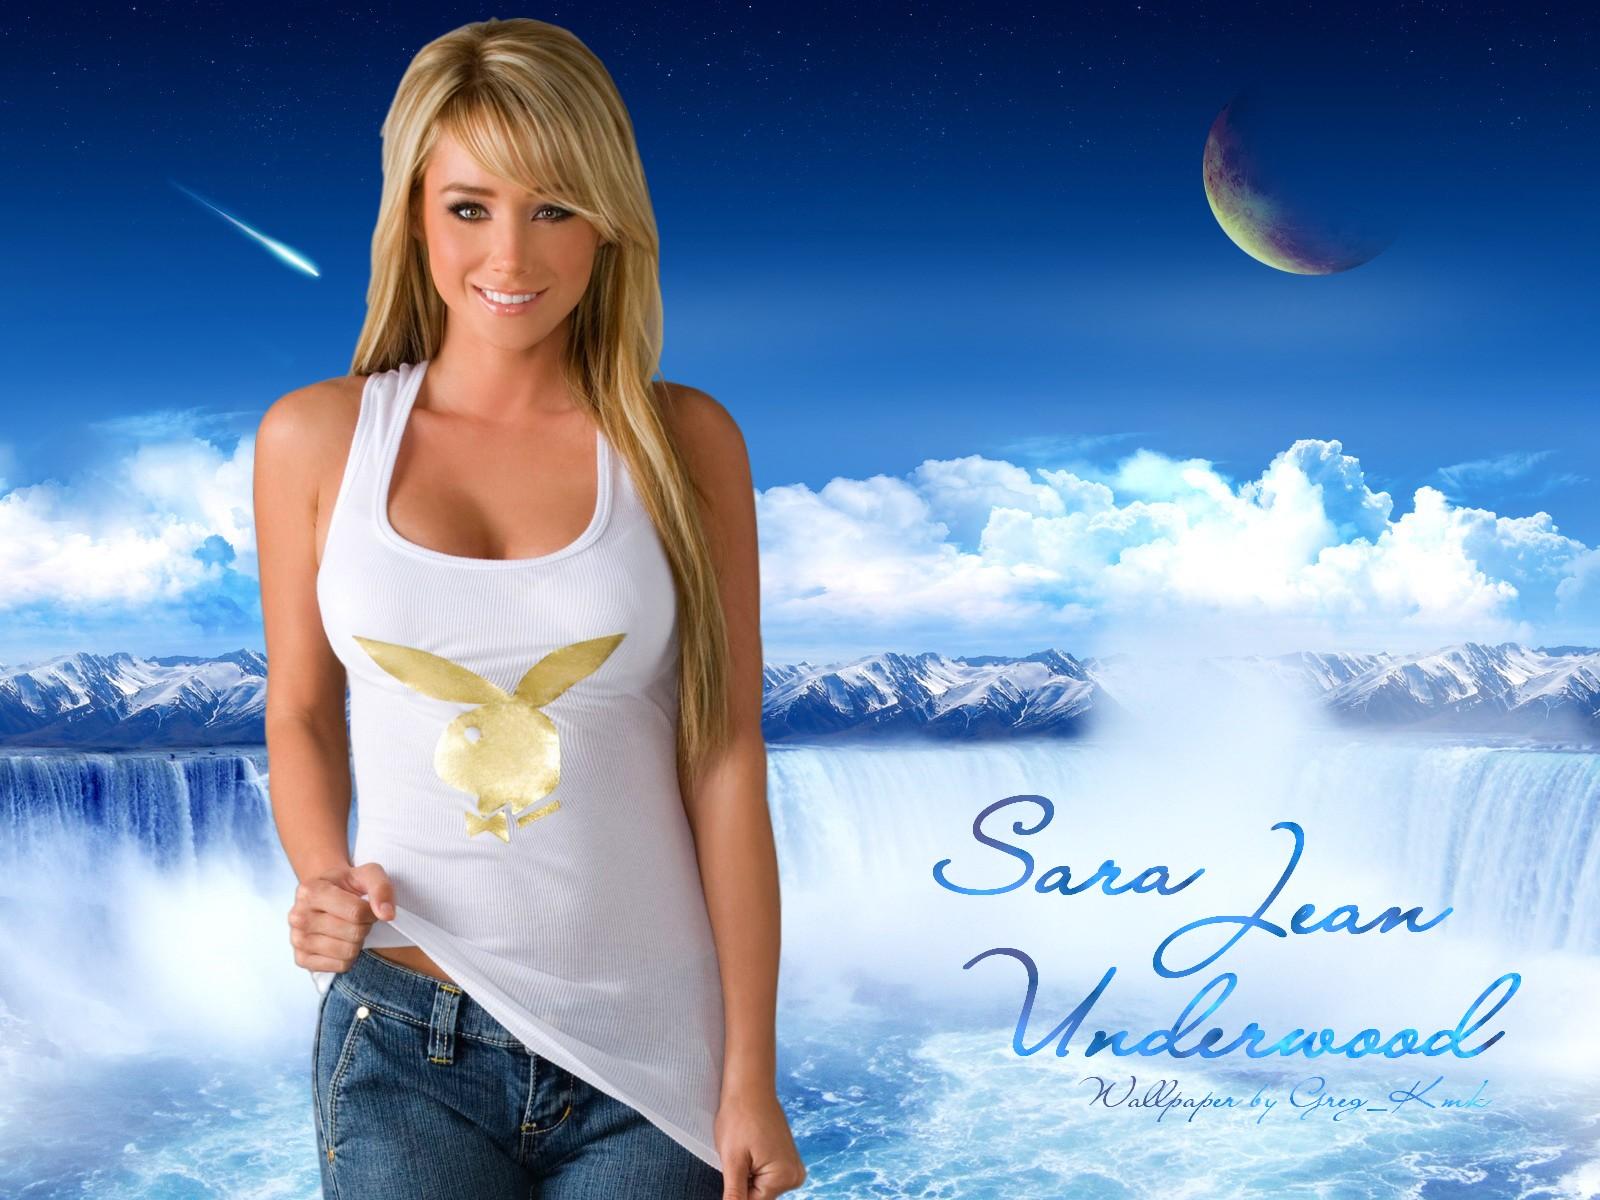 Waleed Wallpapers: Sara Jean Underwood HD Wallpapers